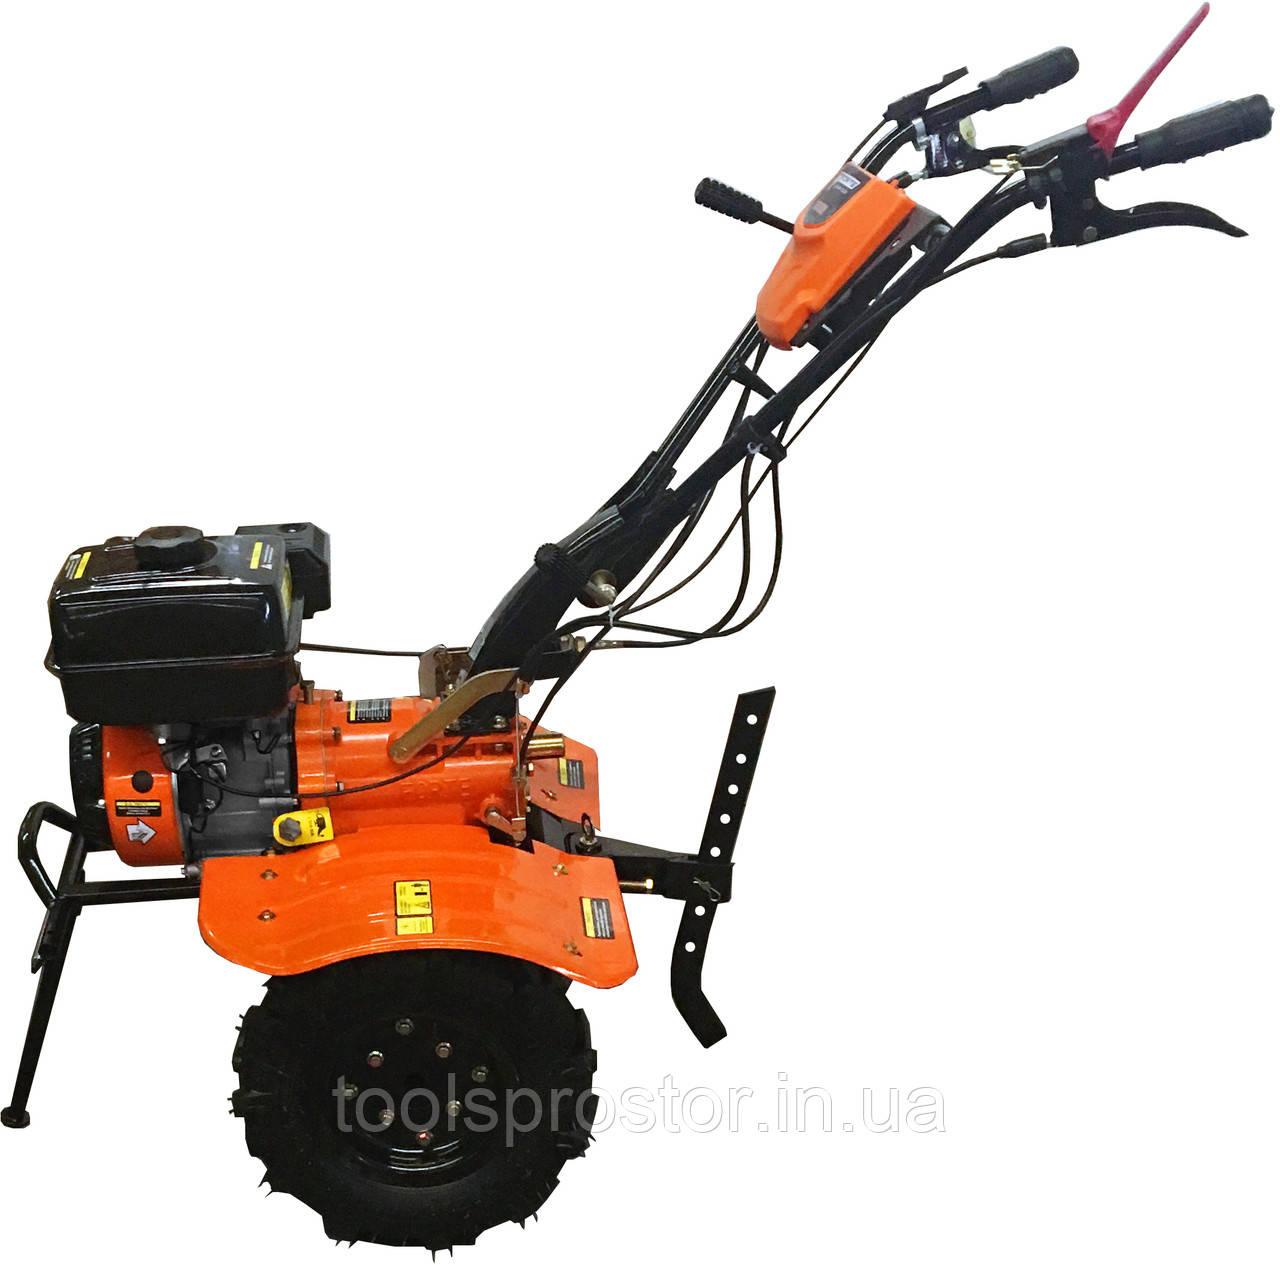 Культиватор Forte 1050GDIF оранжевый